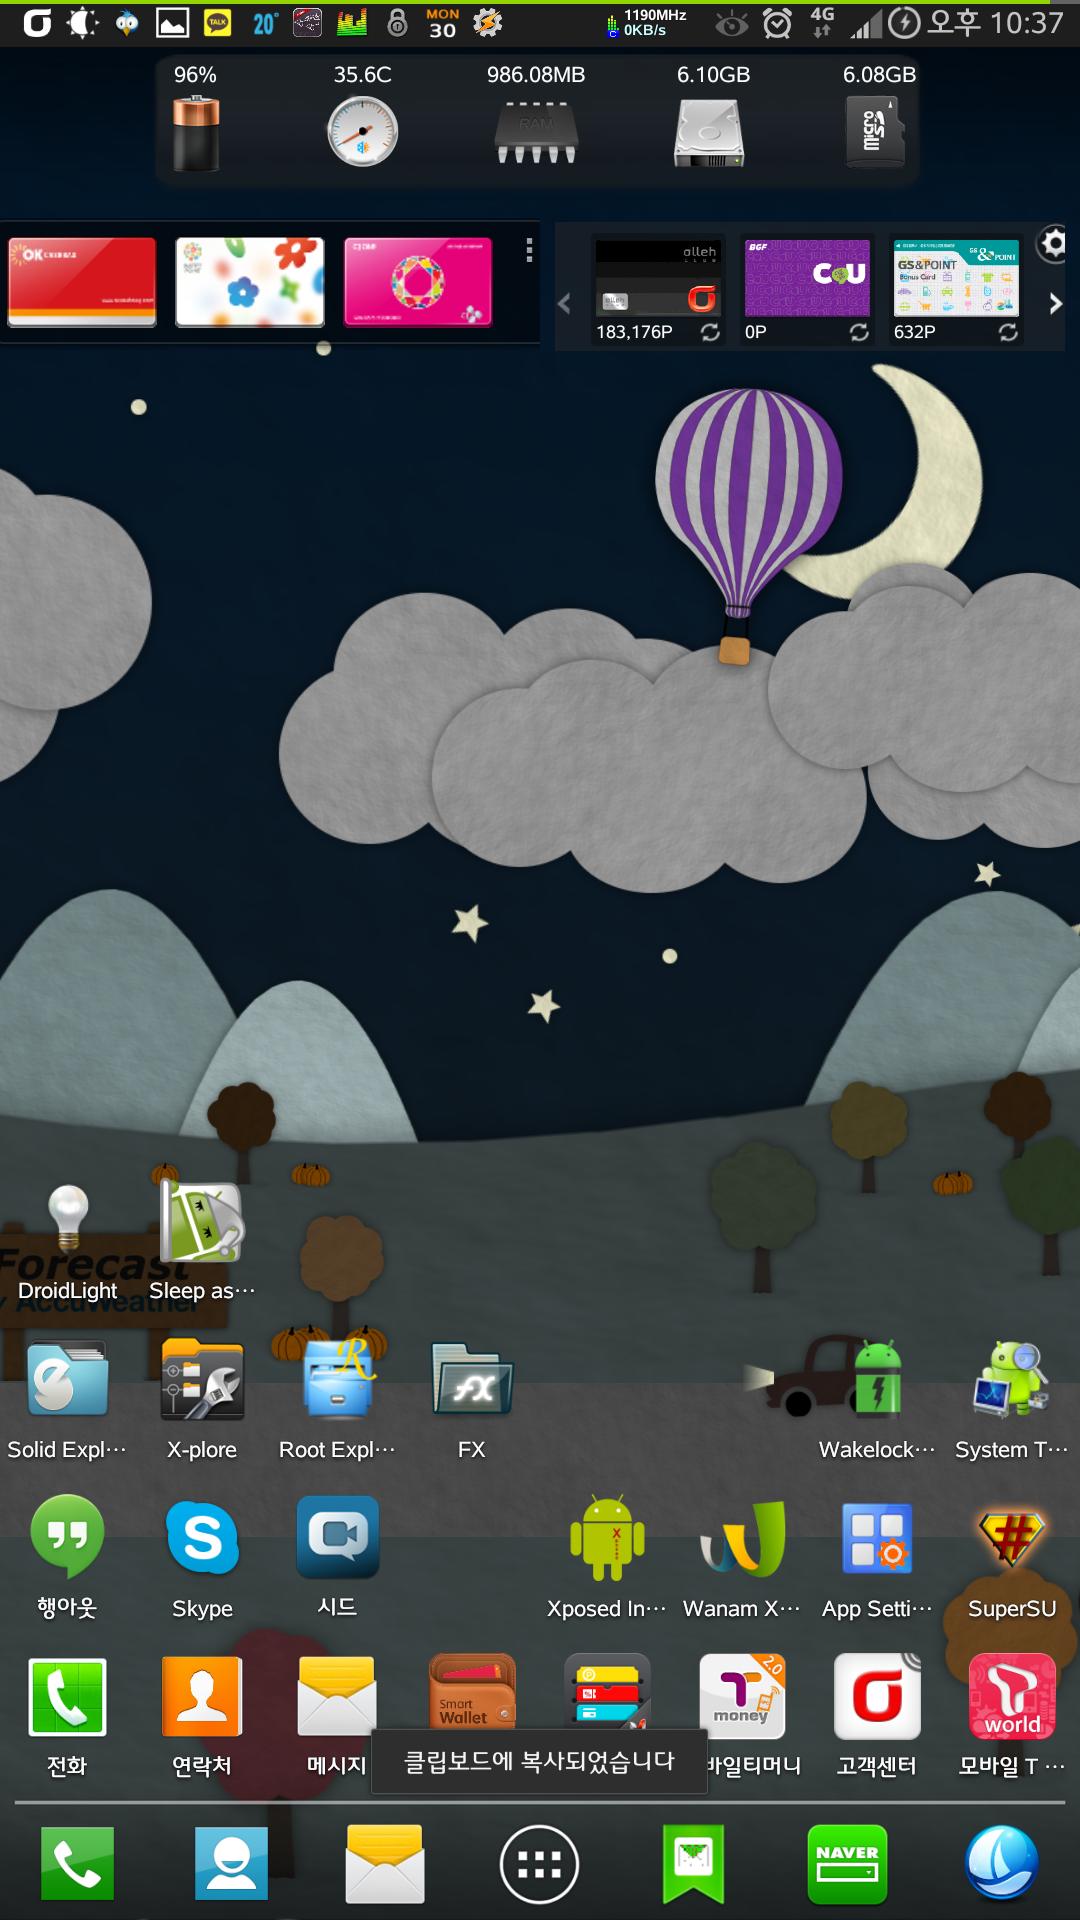 Screenshot_2013-09-30-22-37-41.png